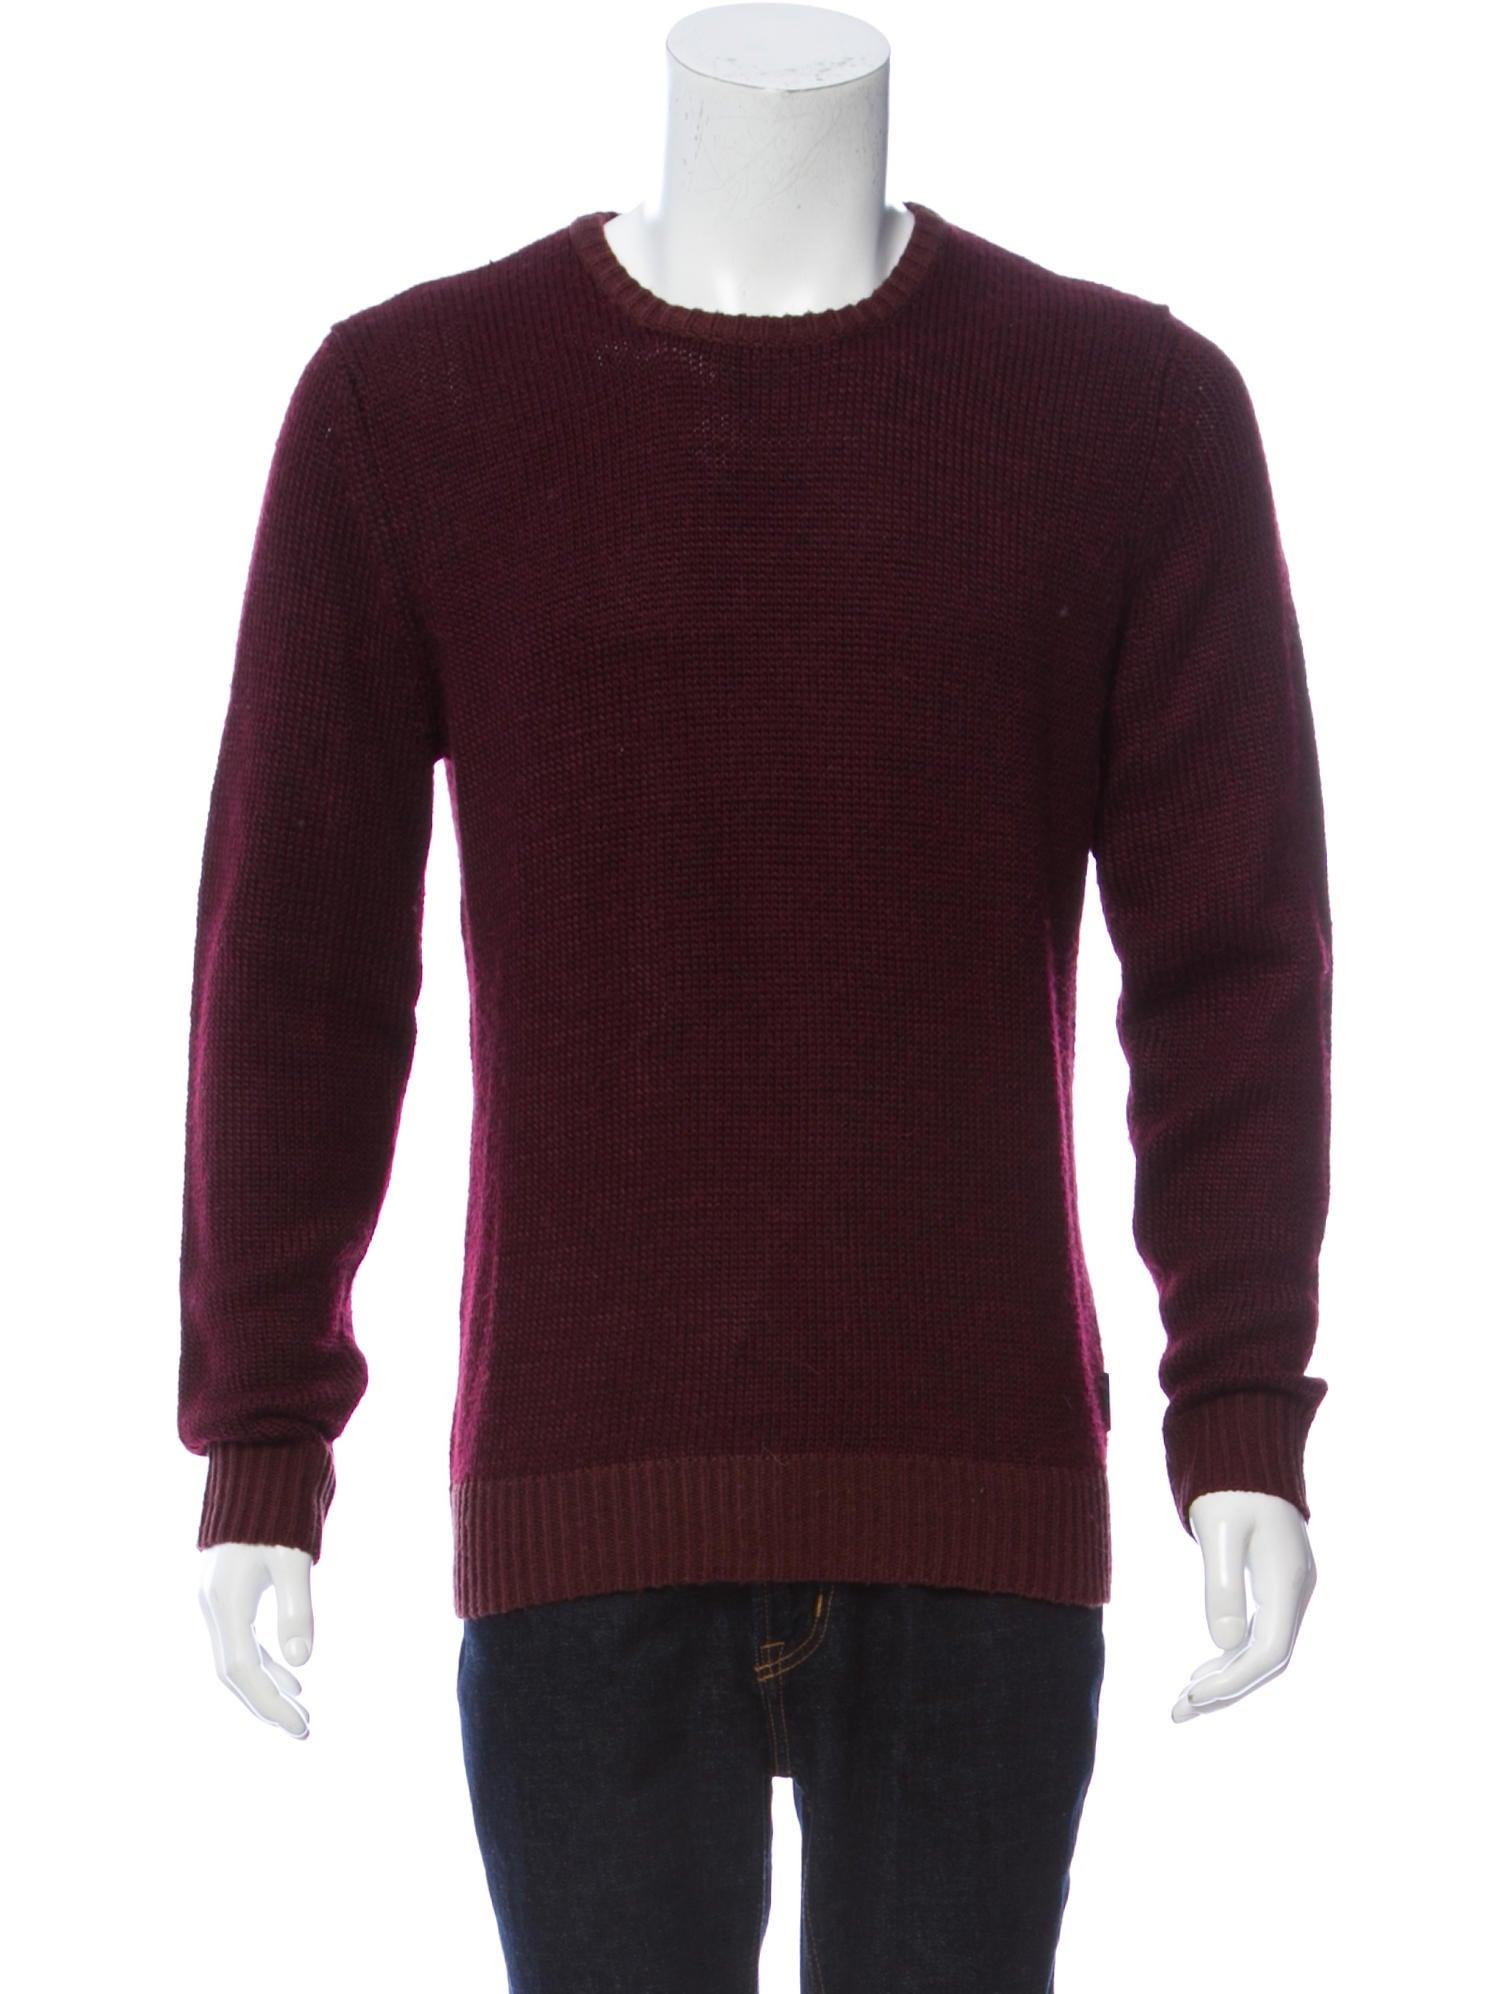 d09a29596ef0 J. Lindeberg Alpaca-Blend Crew Neck Sweater - Clothing - WJLND20549 ...